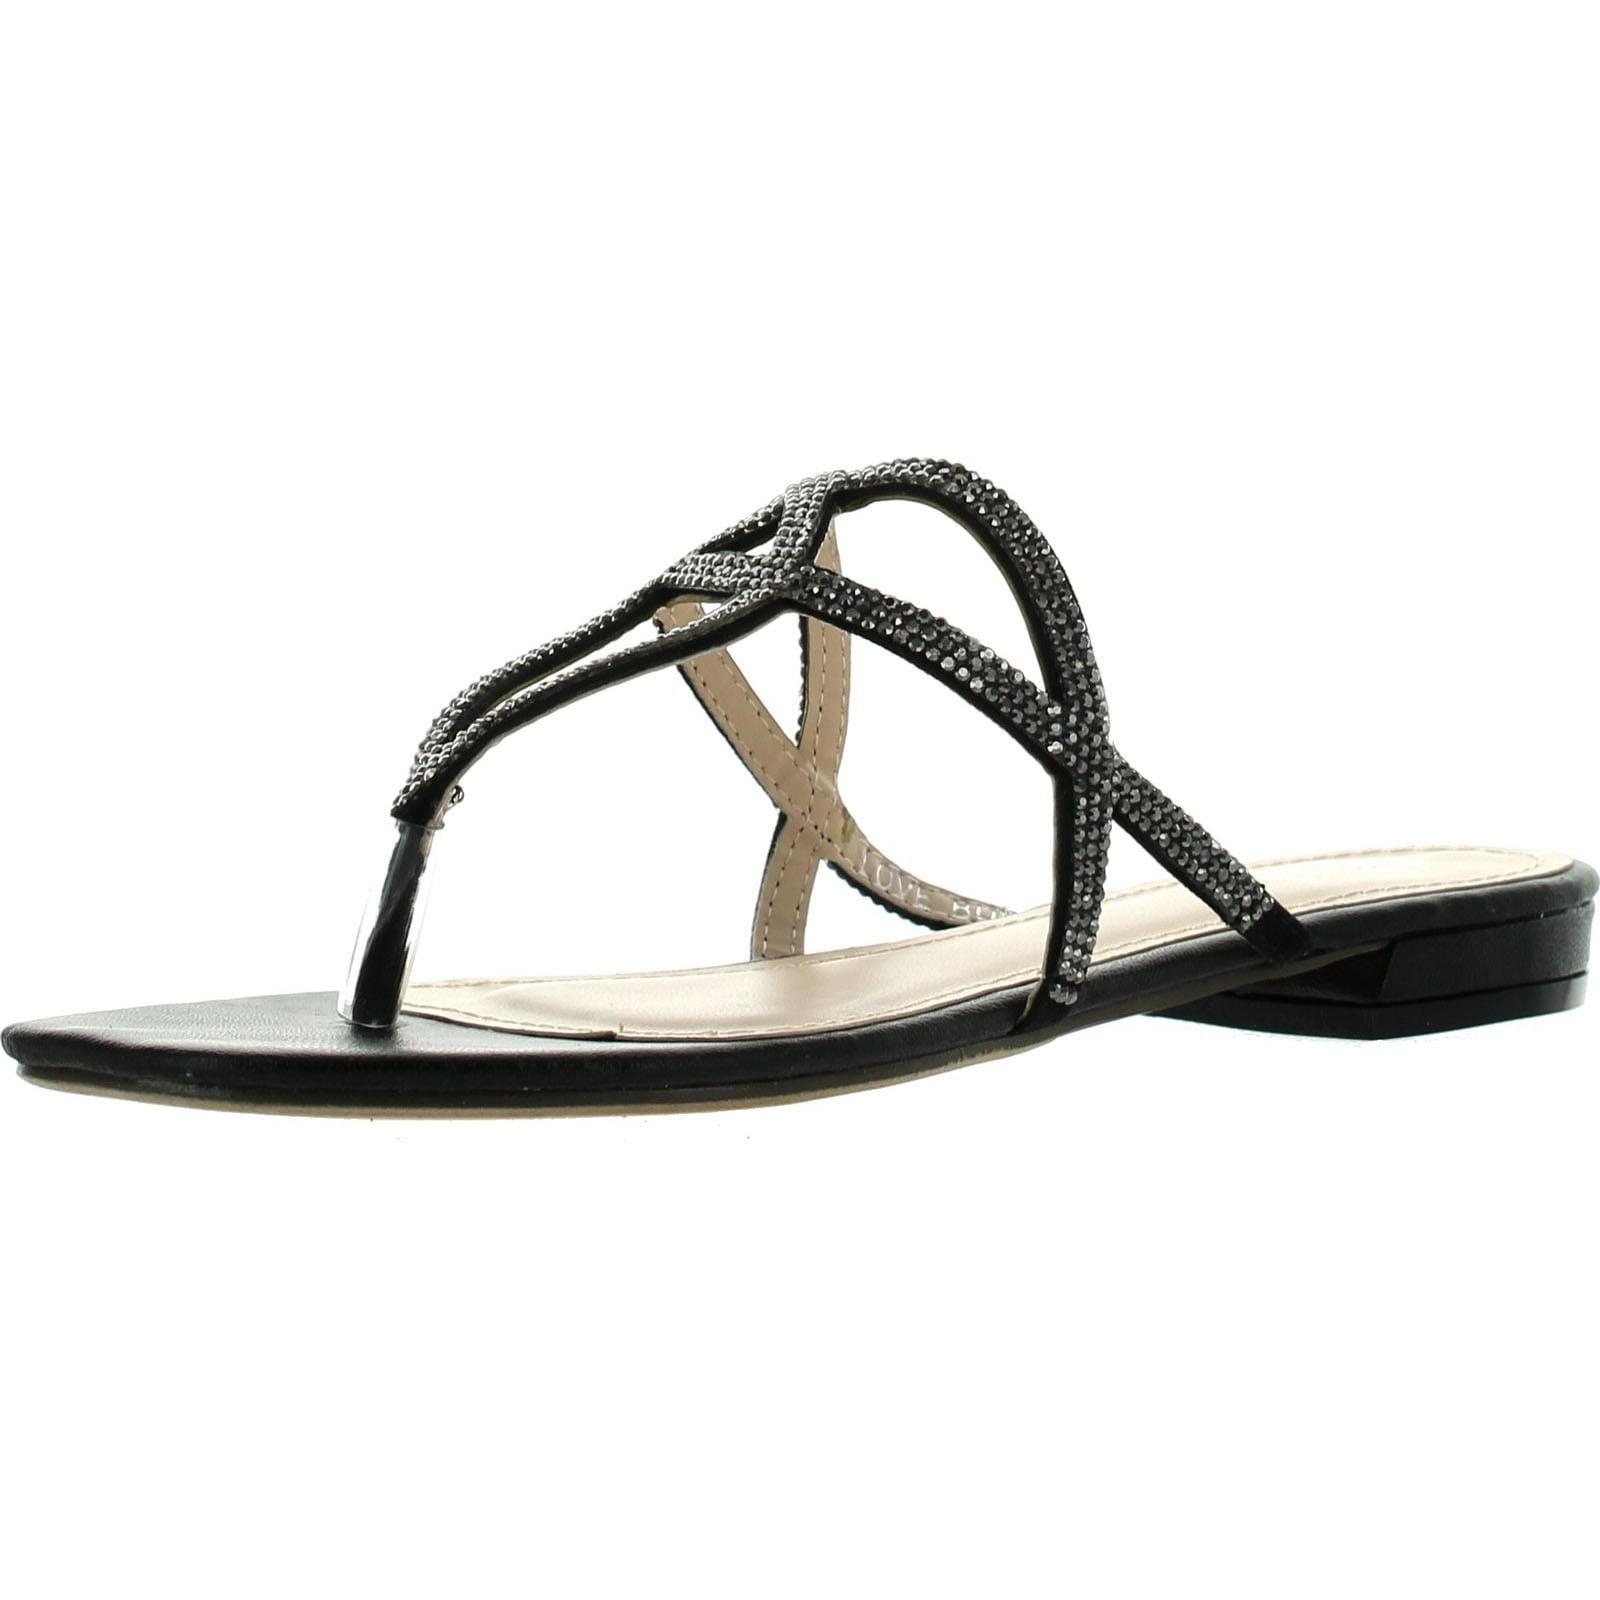 Good Choice Good Choice Womens Love Bug Fashion Sandals Walmart Com Walmart Com